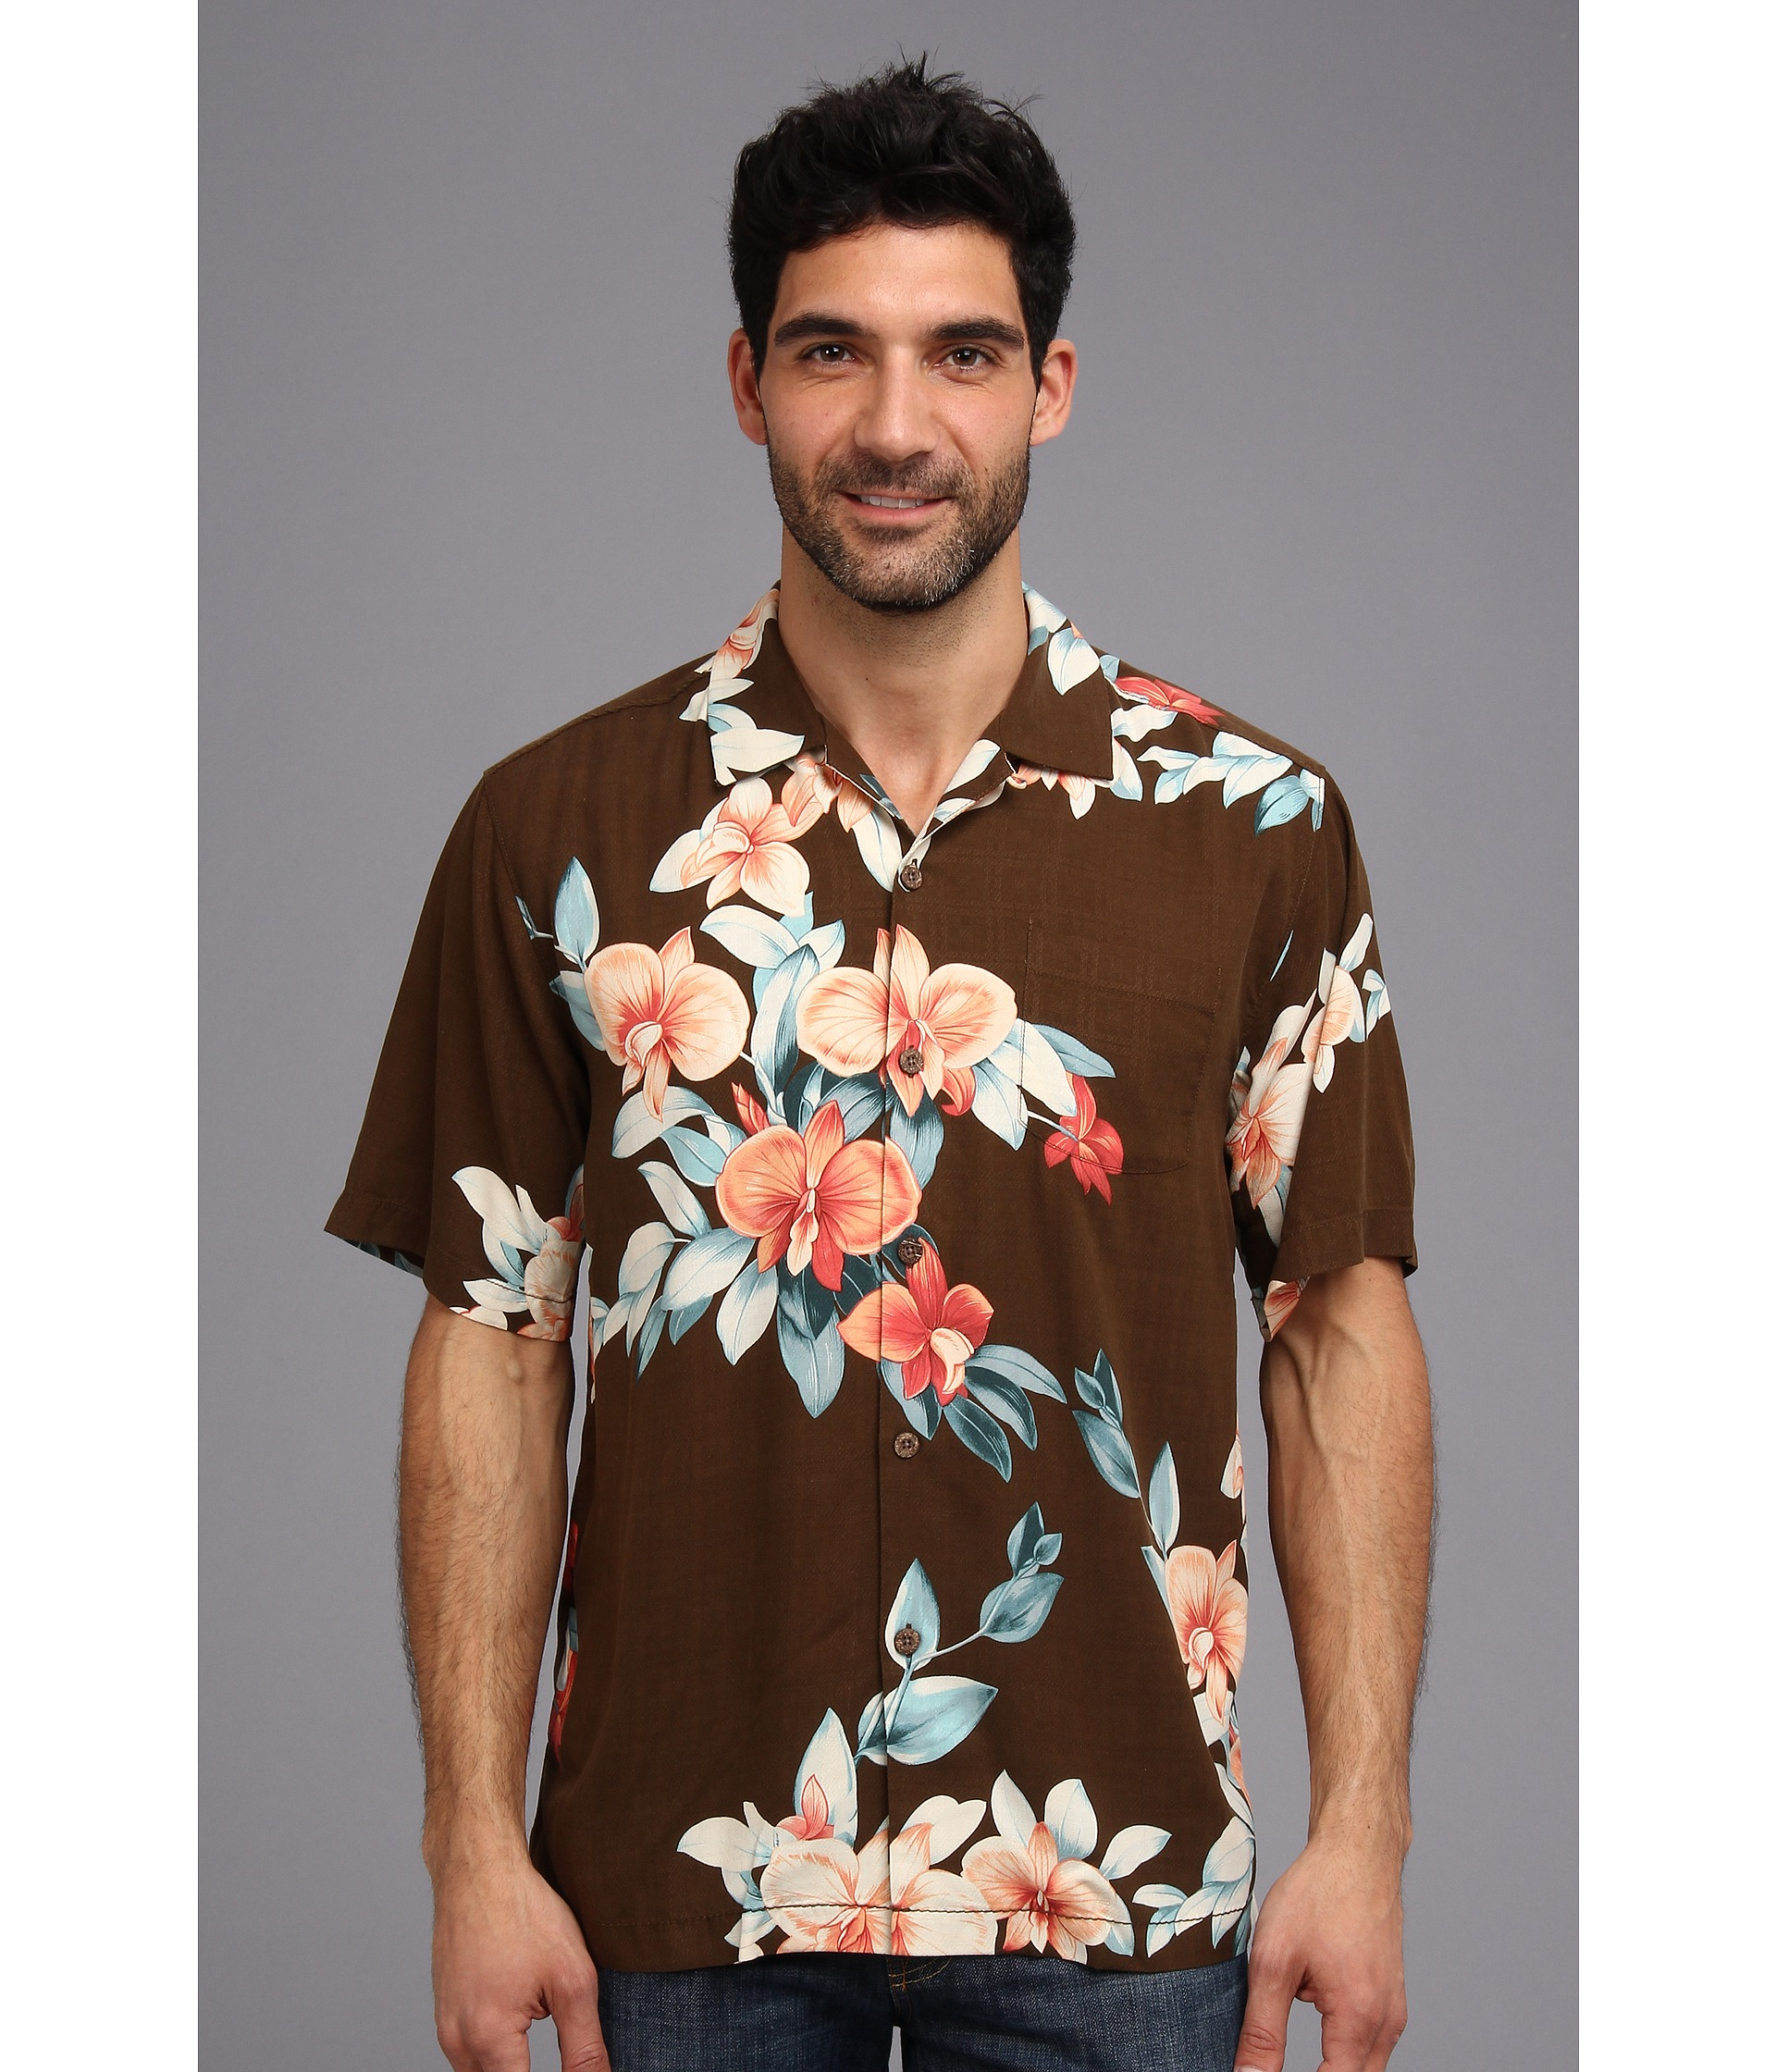 Tommy bahama island modern fit treasure beach floral ss for Tommy bahama christmas shirt 2014